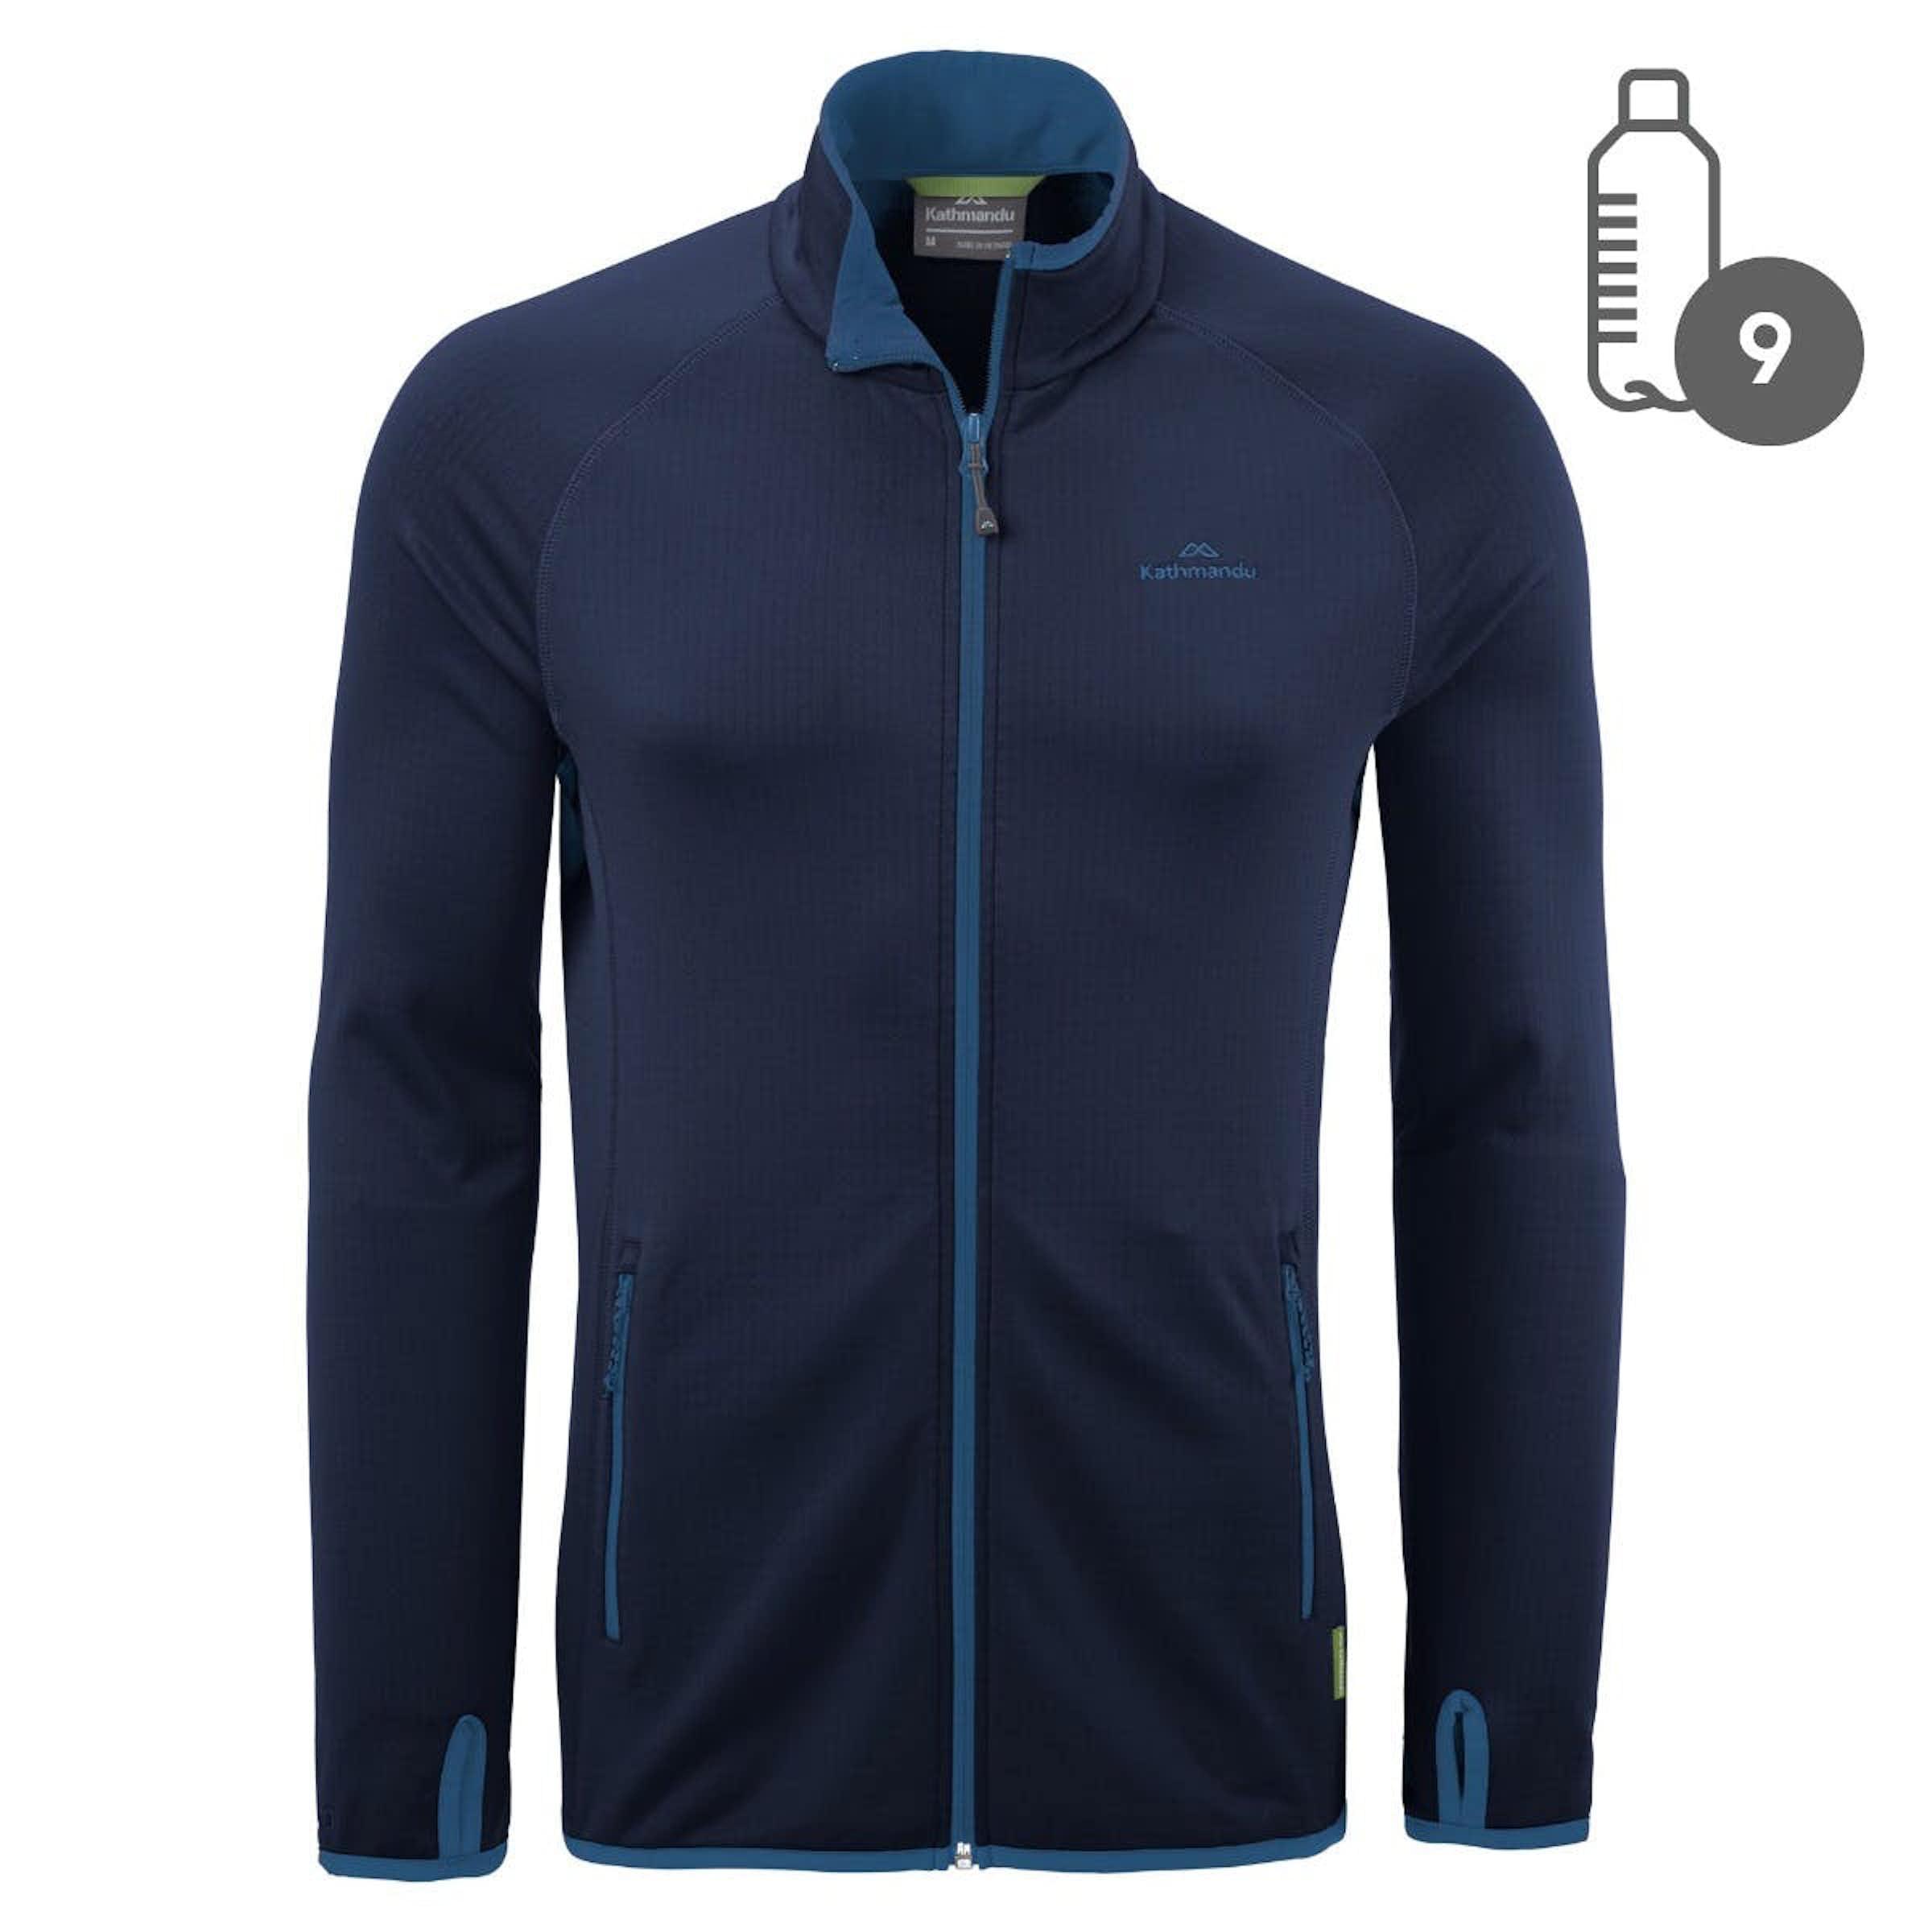 befd4dd6d Mens Jackets for Sale Online   Winter Coats for Men in NZ